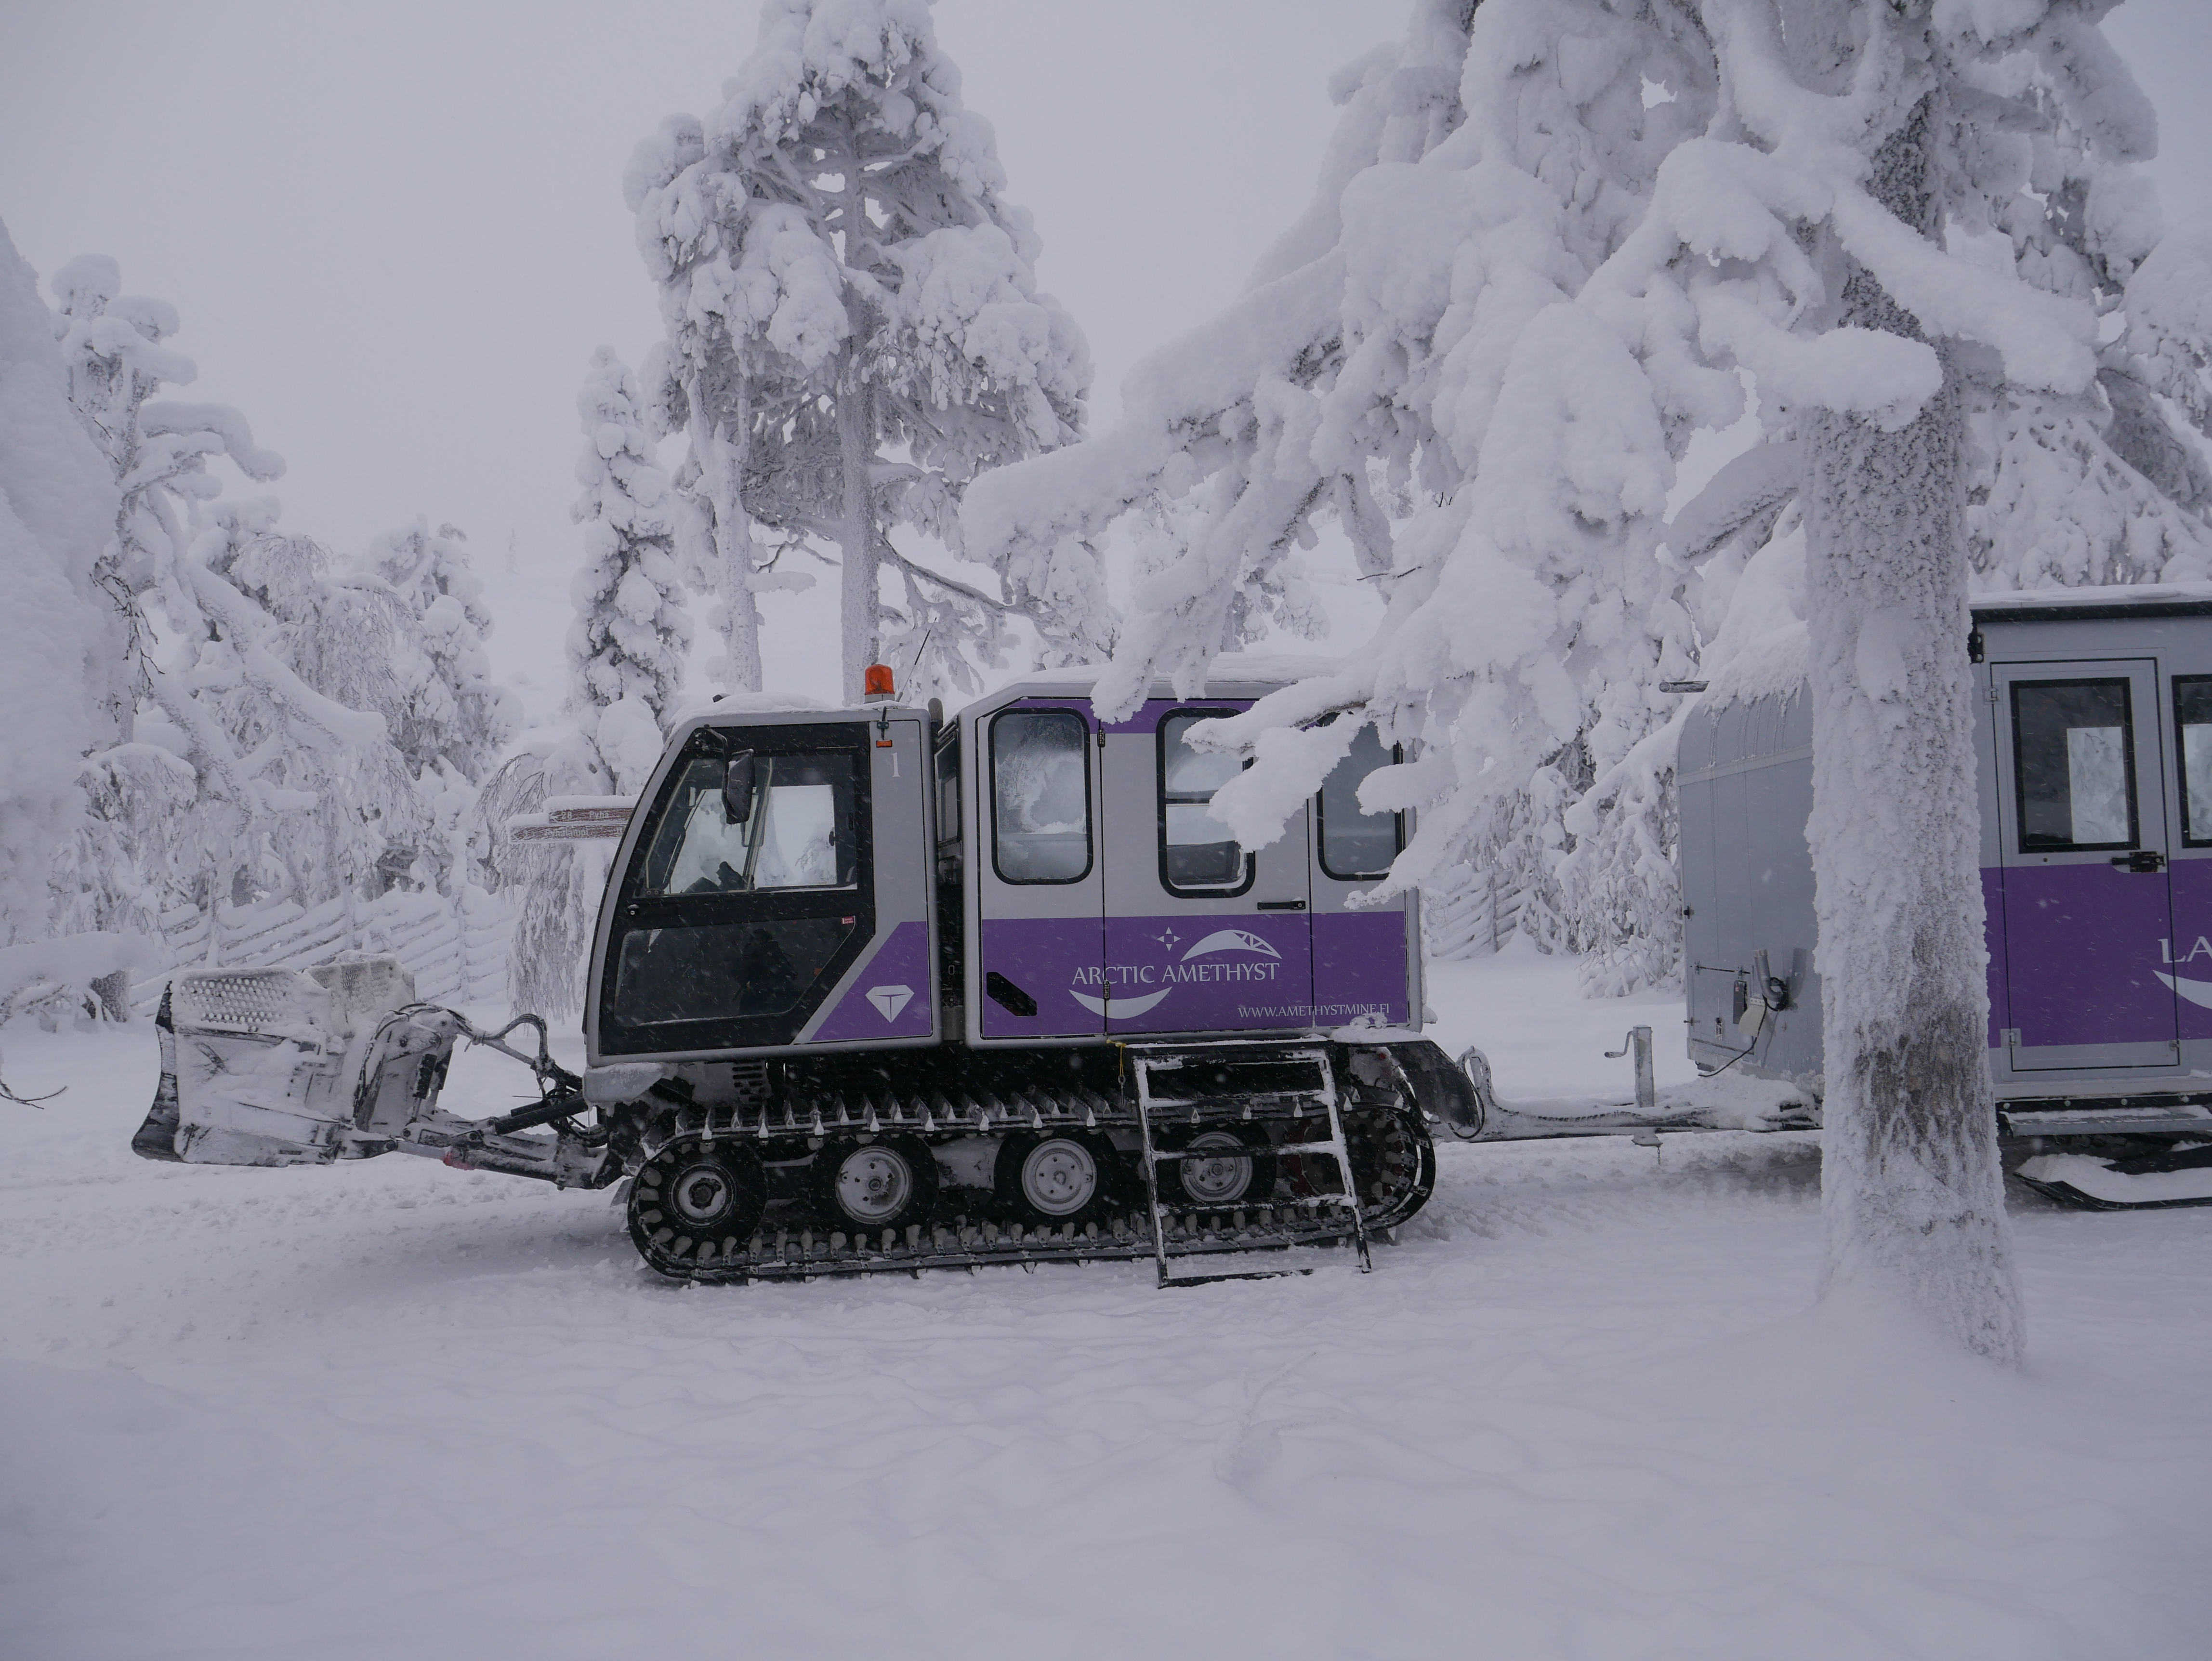 Laponie - Pendolino de la mine d'améthyste